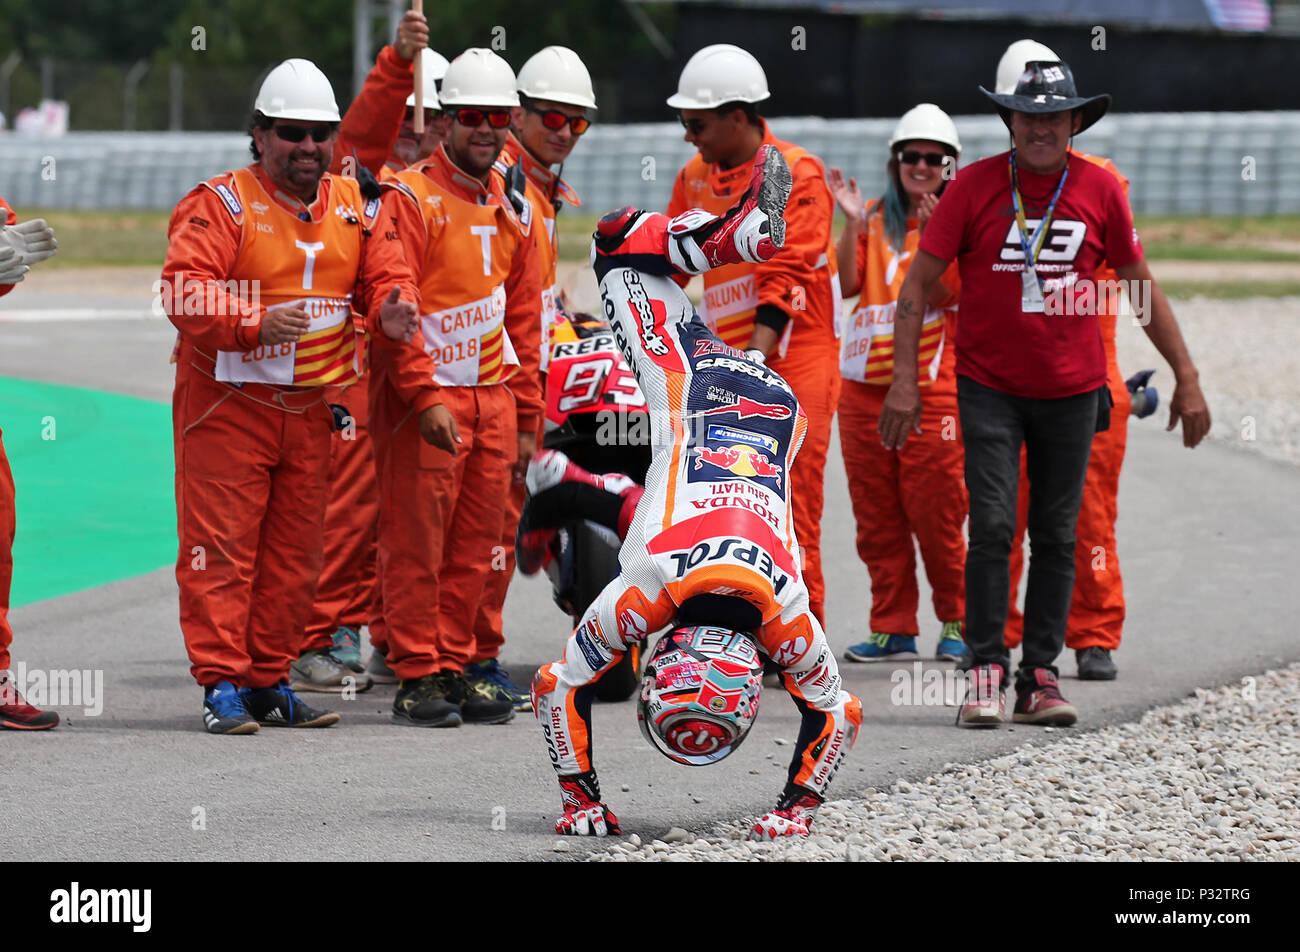 Barcelona -17th June 2018- SPAIN: Marc Marquez (Honda) at the end of the  the GP Catalunya Moto GP, in the Barcelona-Catalunya Circuit, on 17th June 2018. Photo: Joan Valls/Urbanandsport/Cordon Press - Stock Image